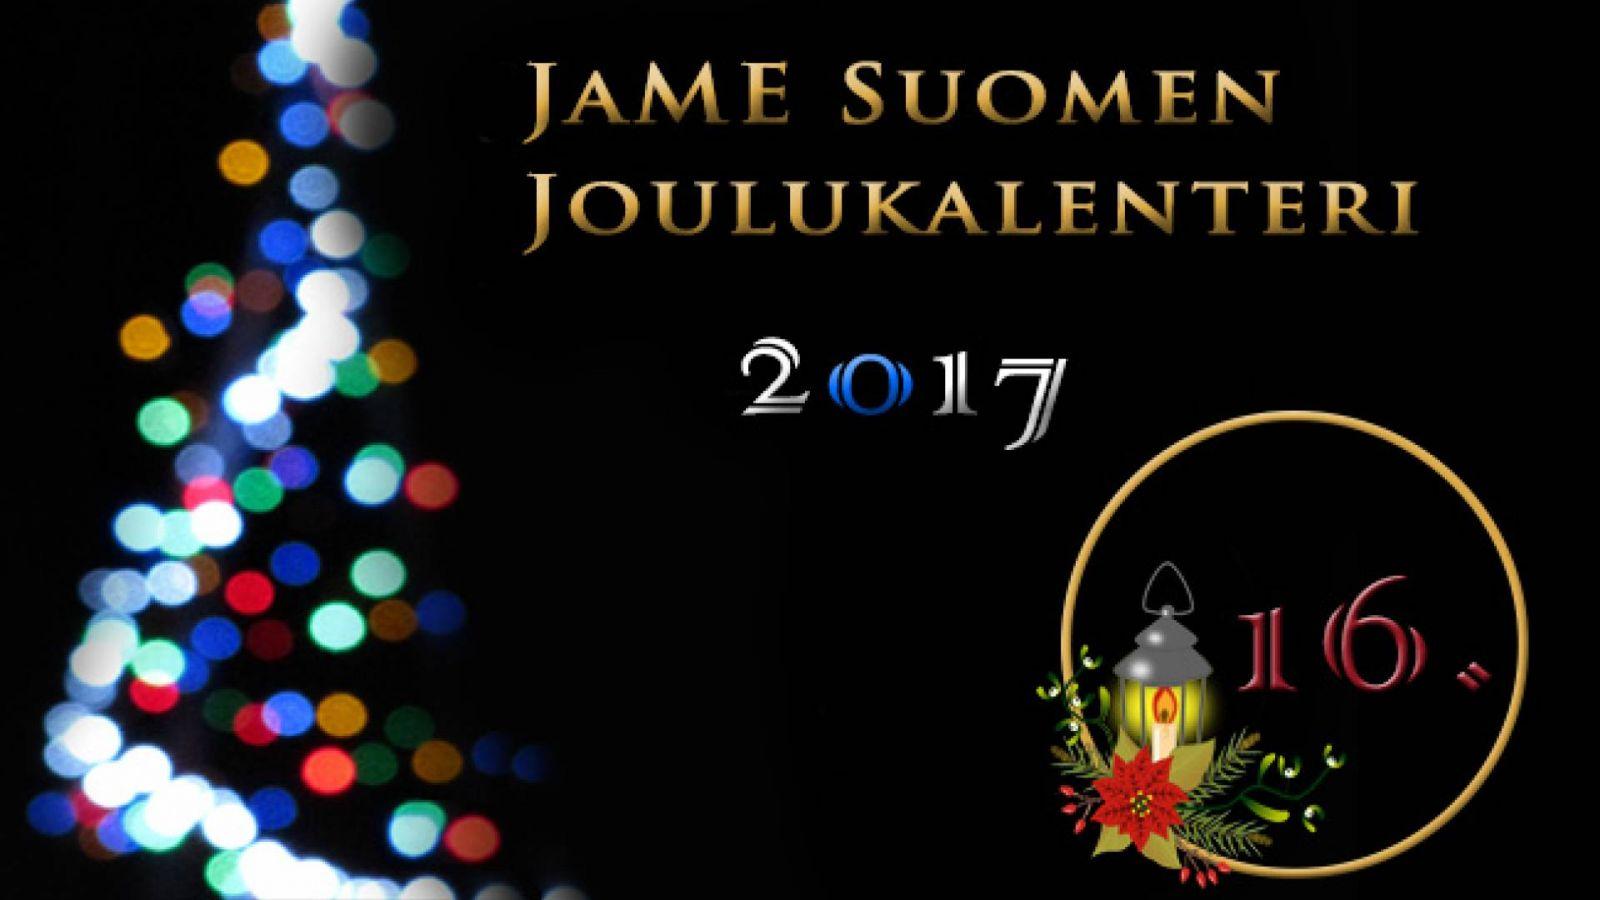 JaME Suomen joulukalenterin 16. luukku © Nipsu